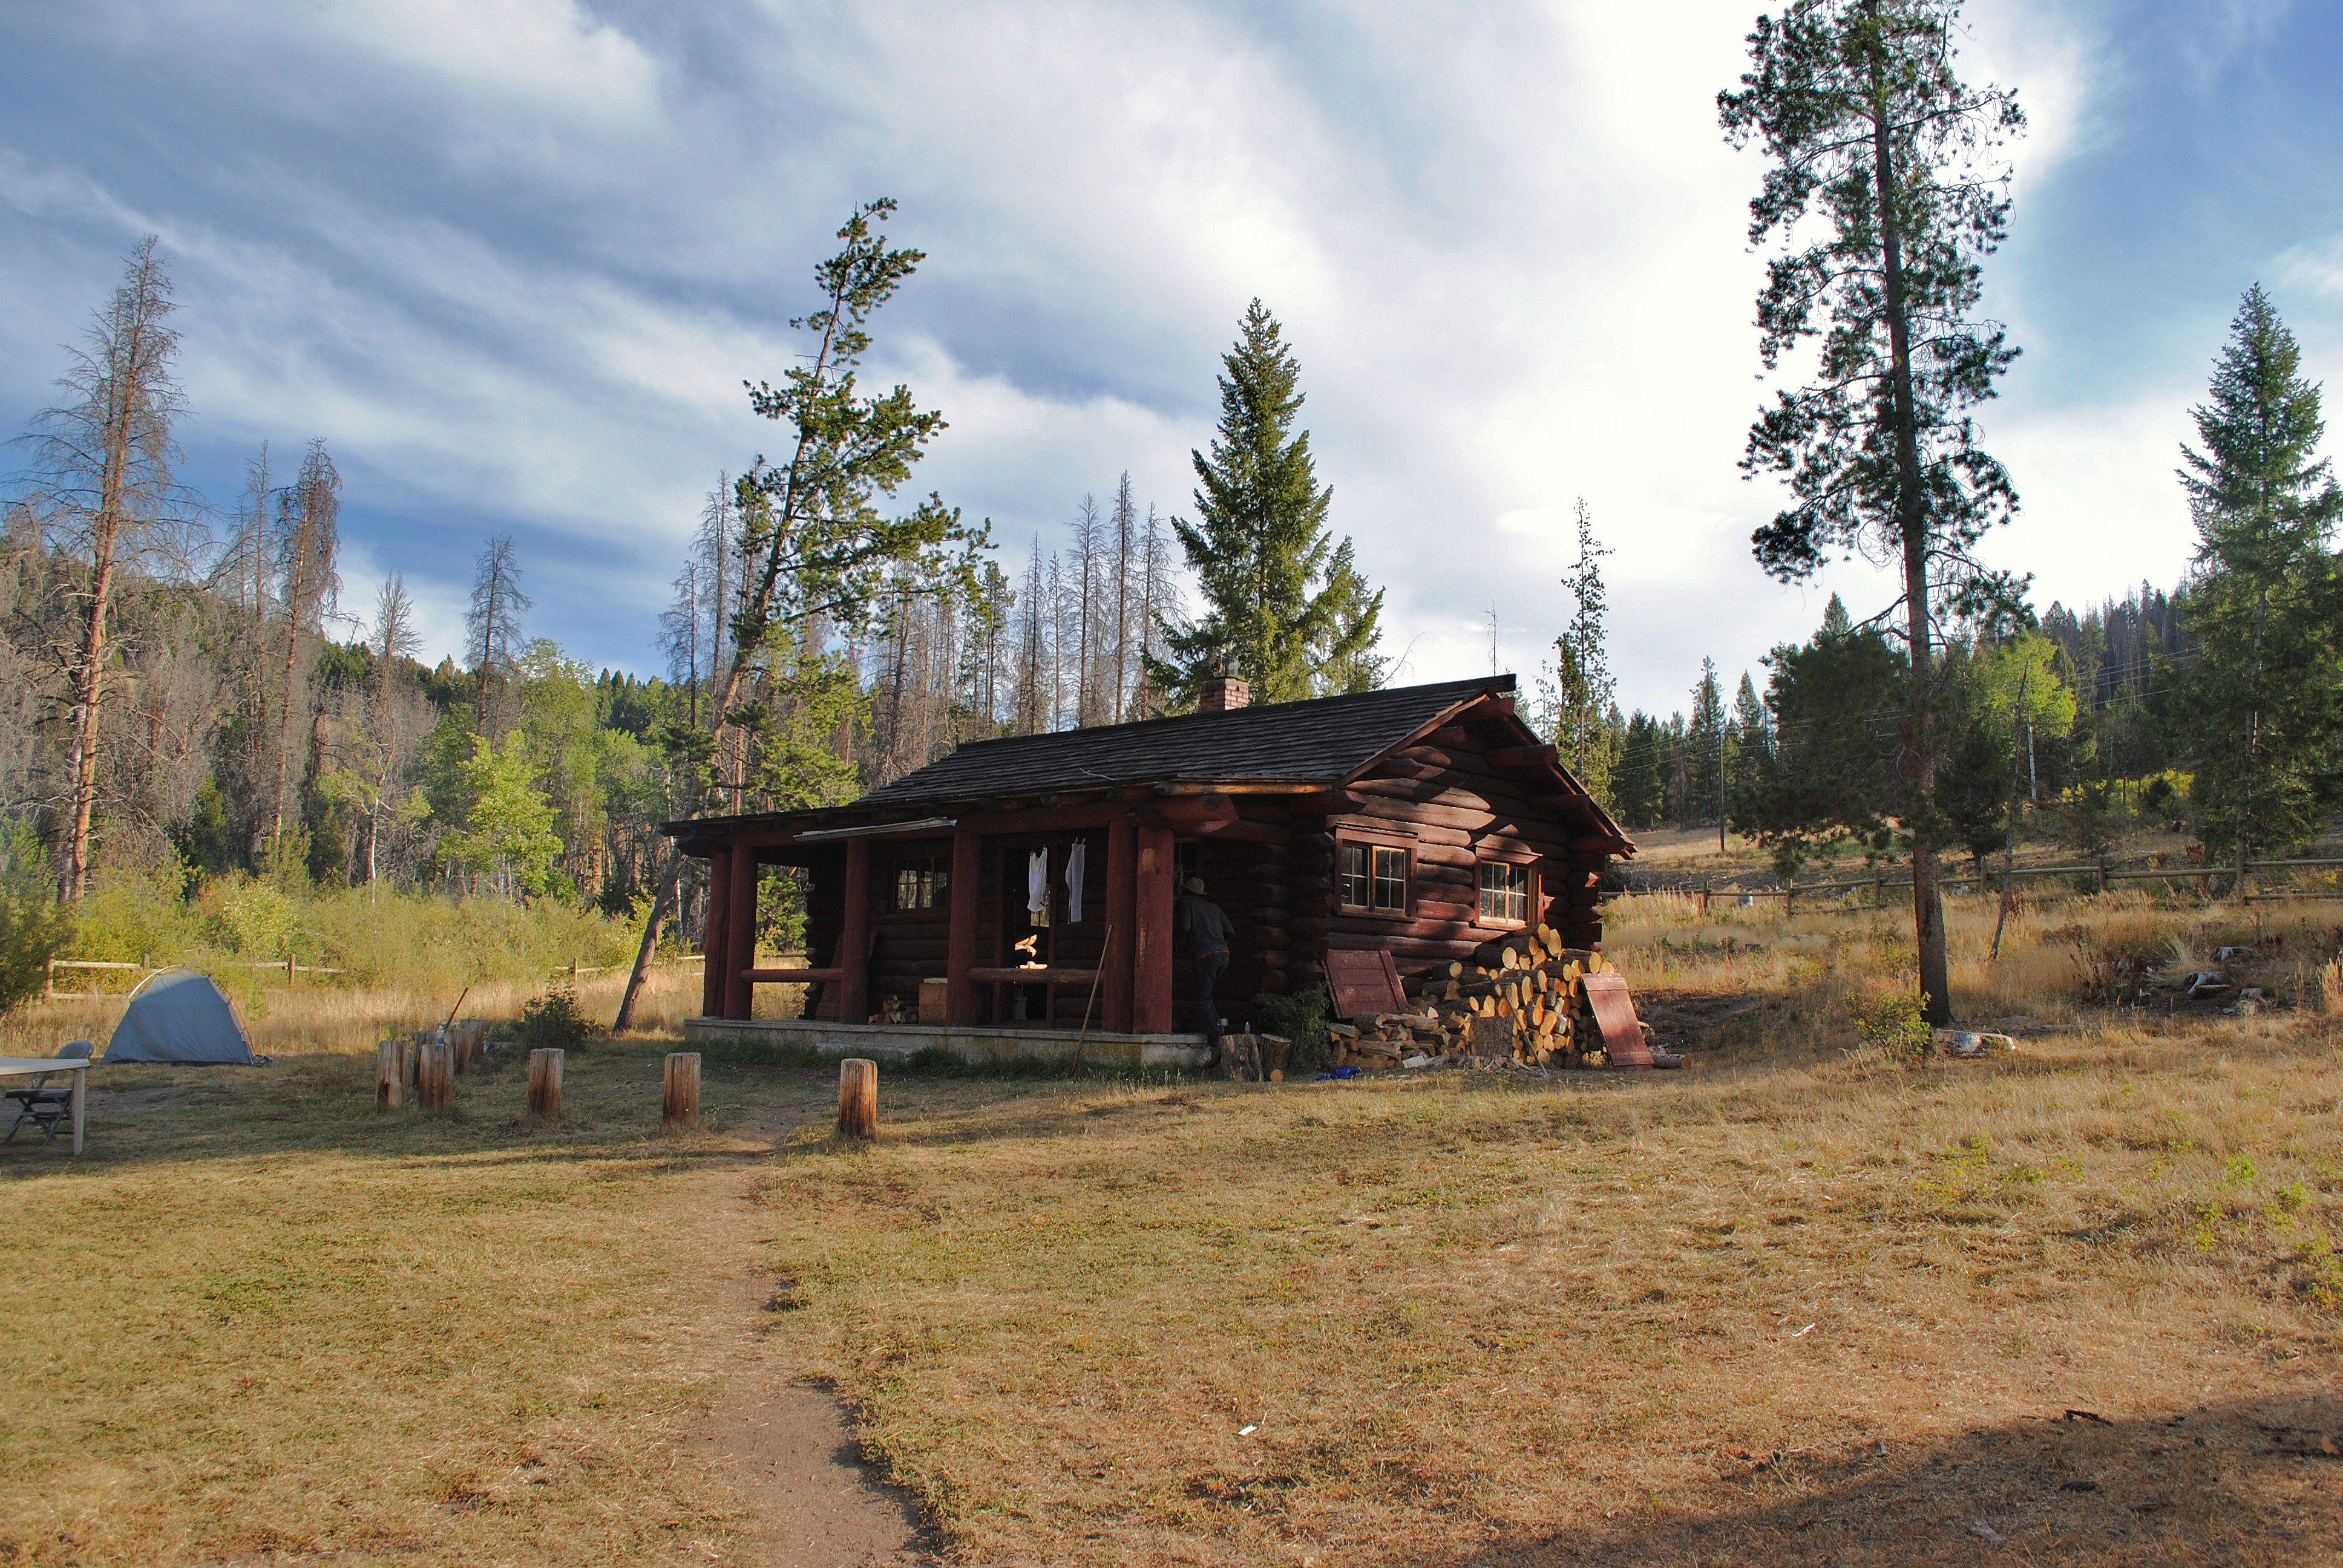 montana cabins - Pesquisa Google